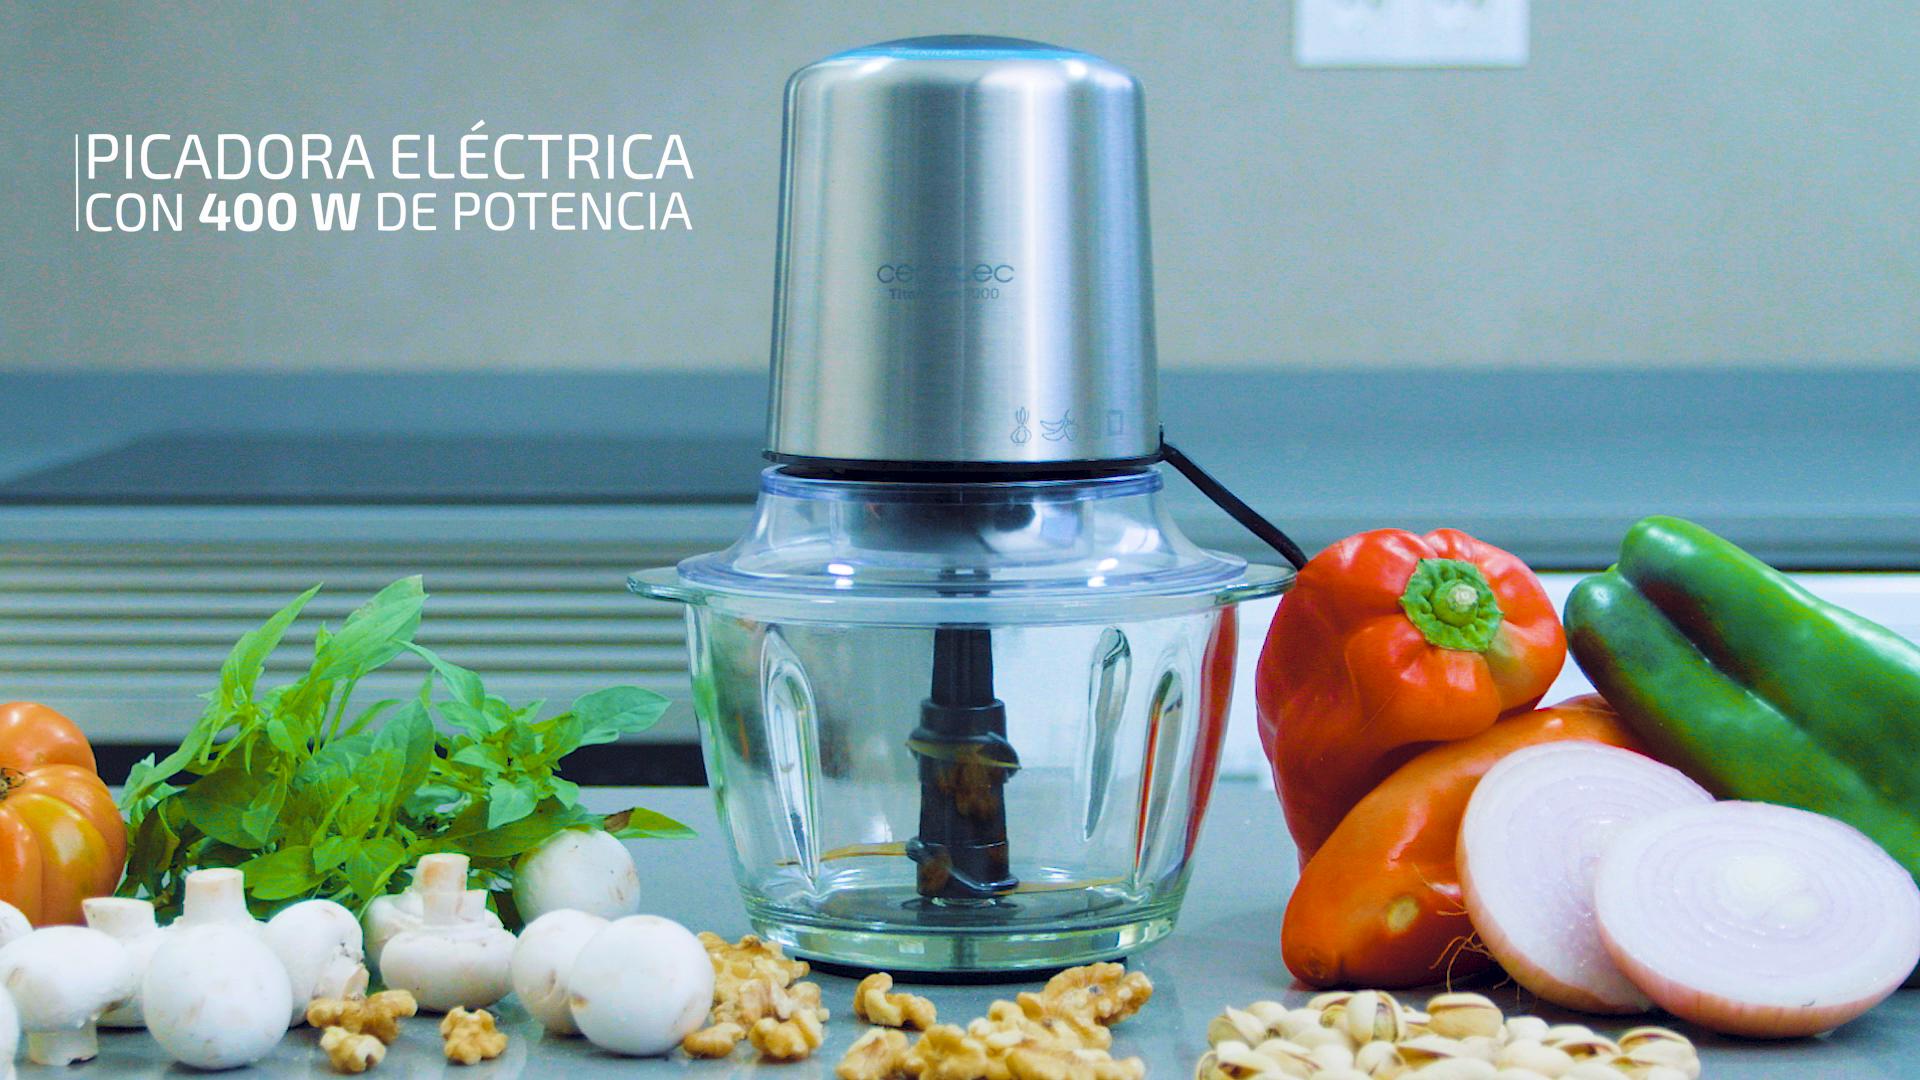 Cecotec Picadora Eléctrica TitanGlass 1000. Multifuncion (Pica ...